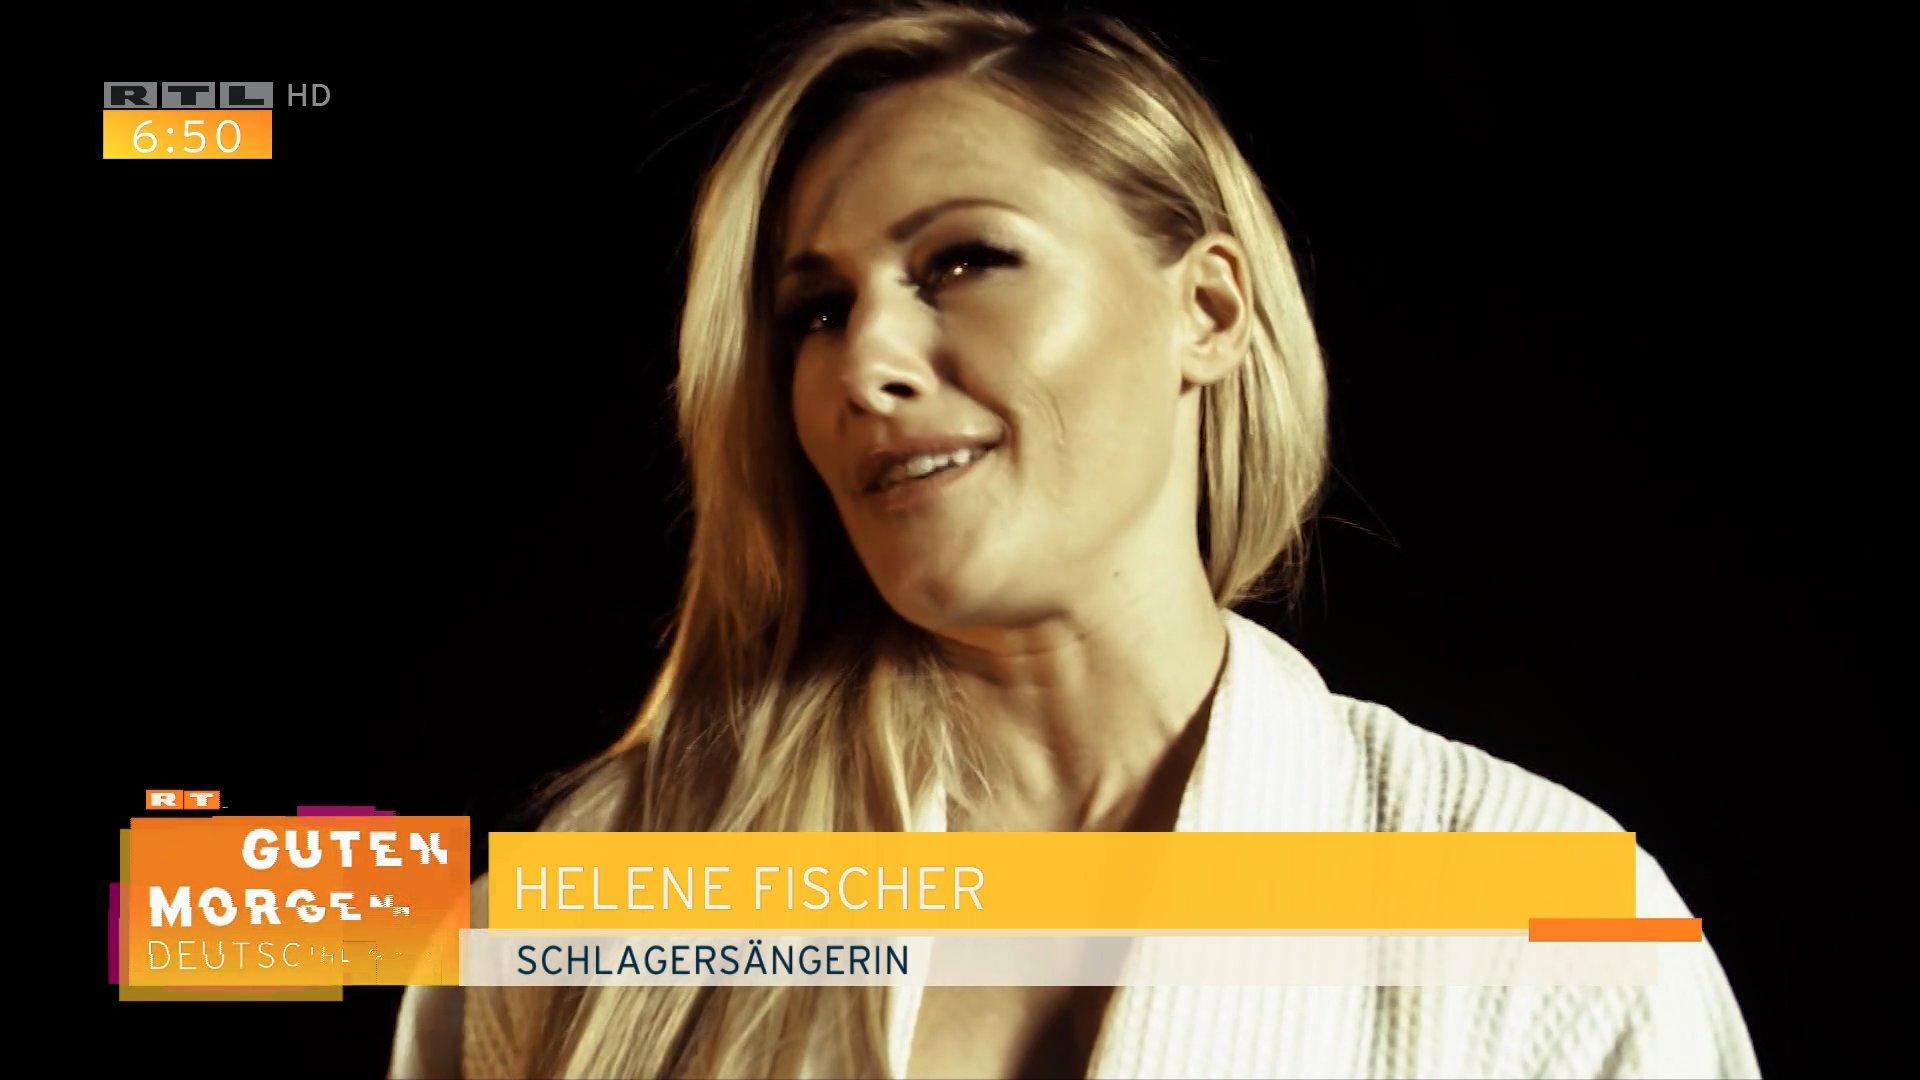 Pic-Upload.de - Helene-Fischer-Backstage-049.jpg